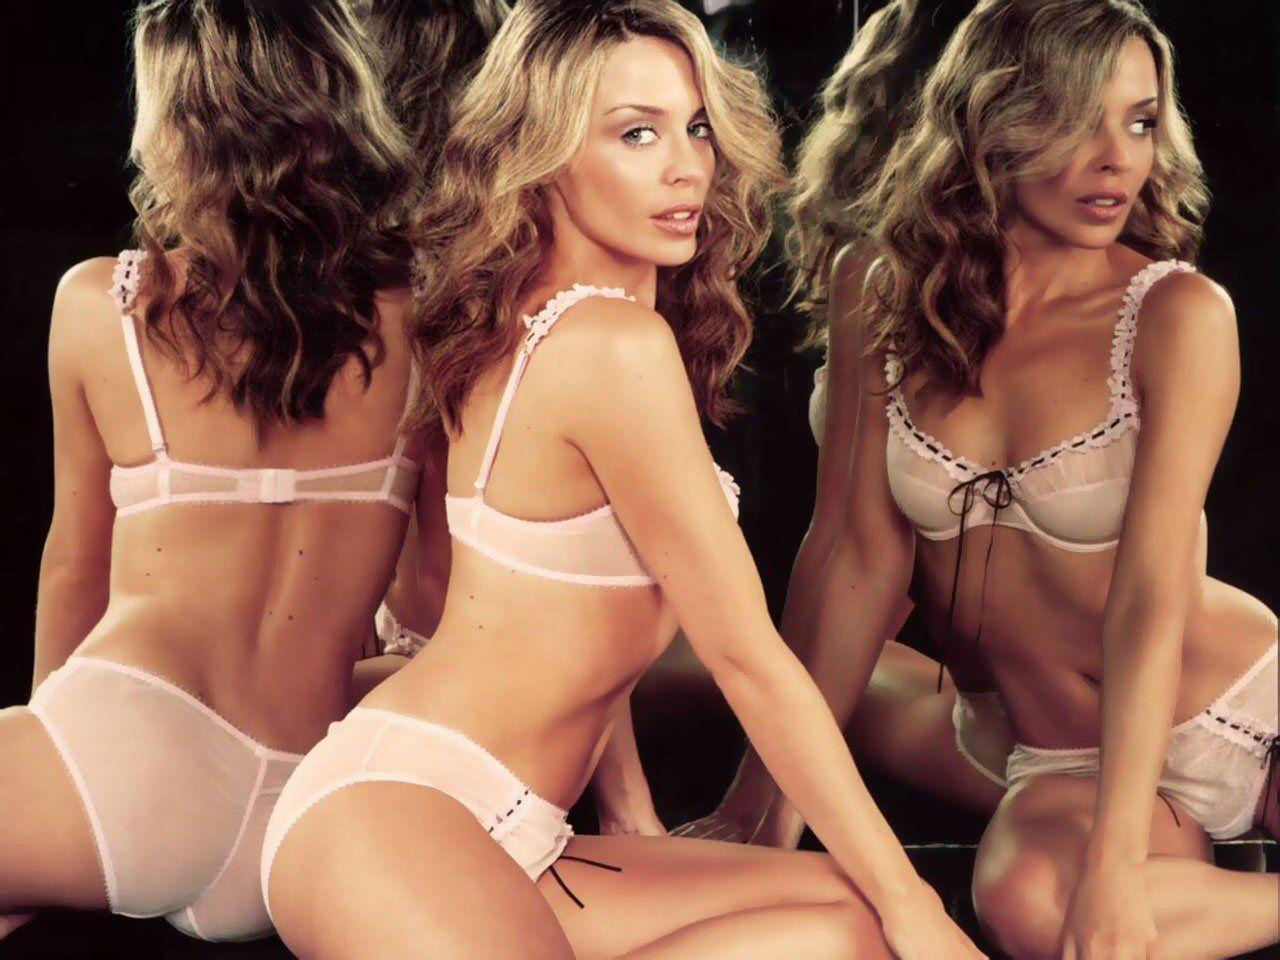 Kylie minogue lingerie advert 10